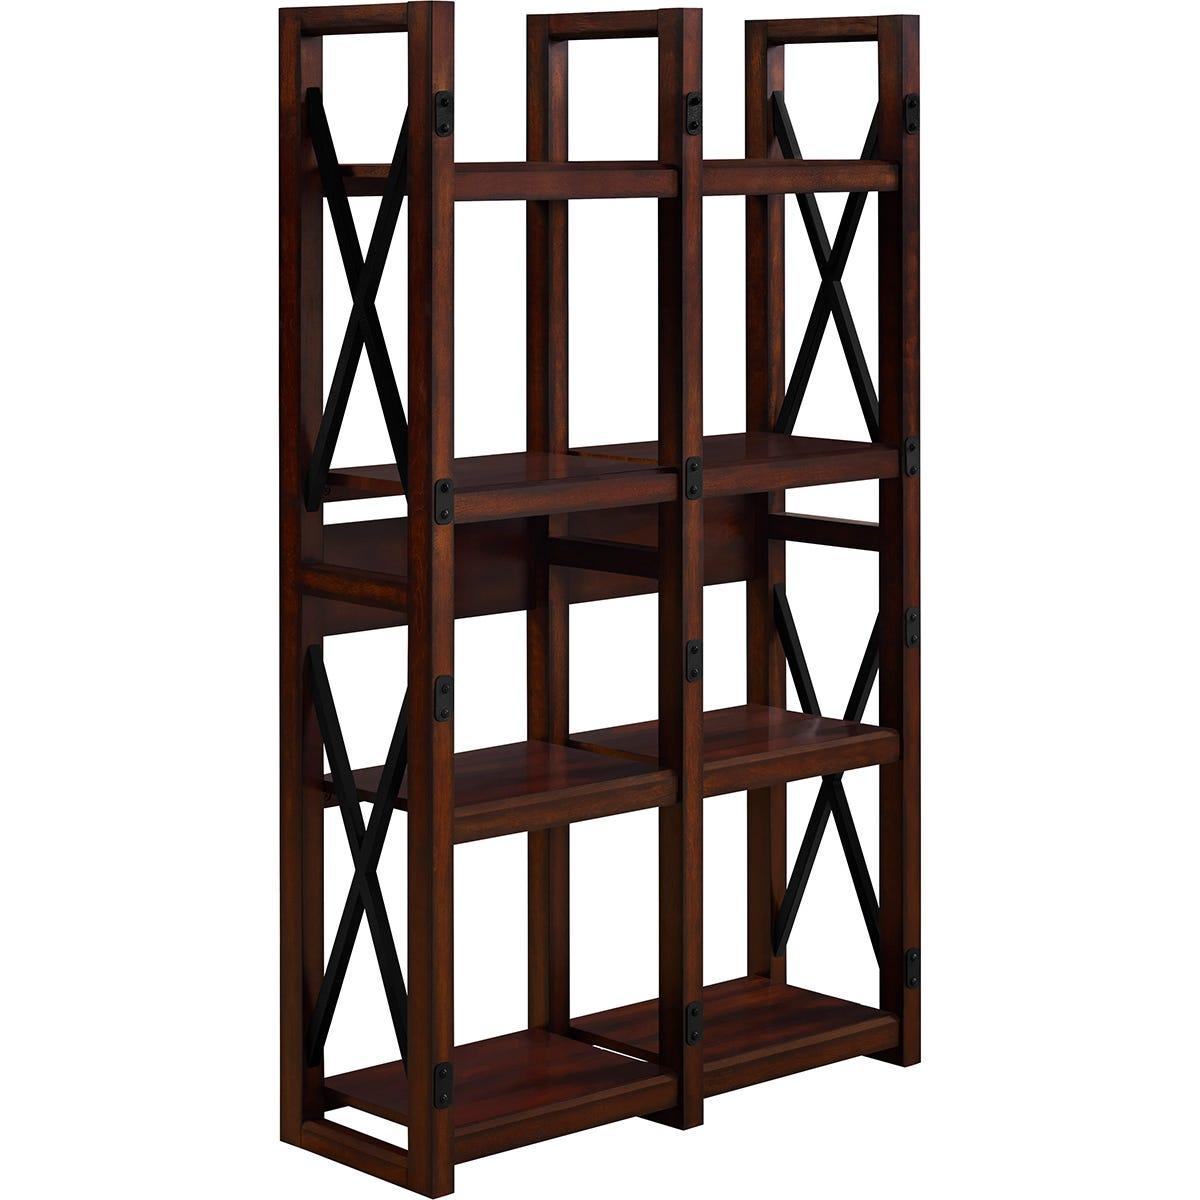 Dorel Wildwood Bookcase/Room Divider - Espresso